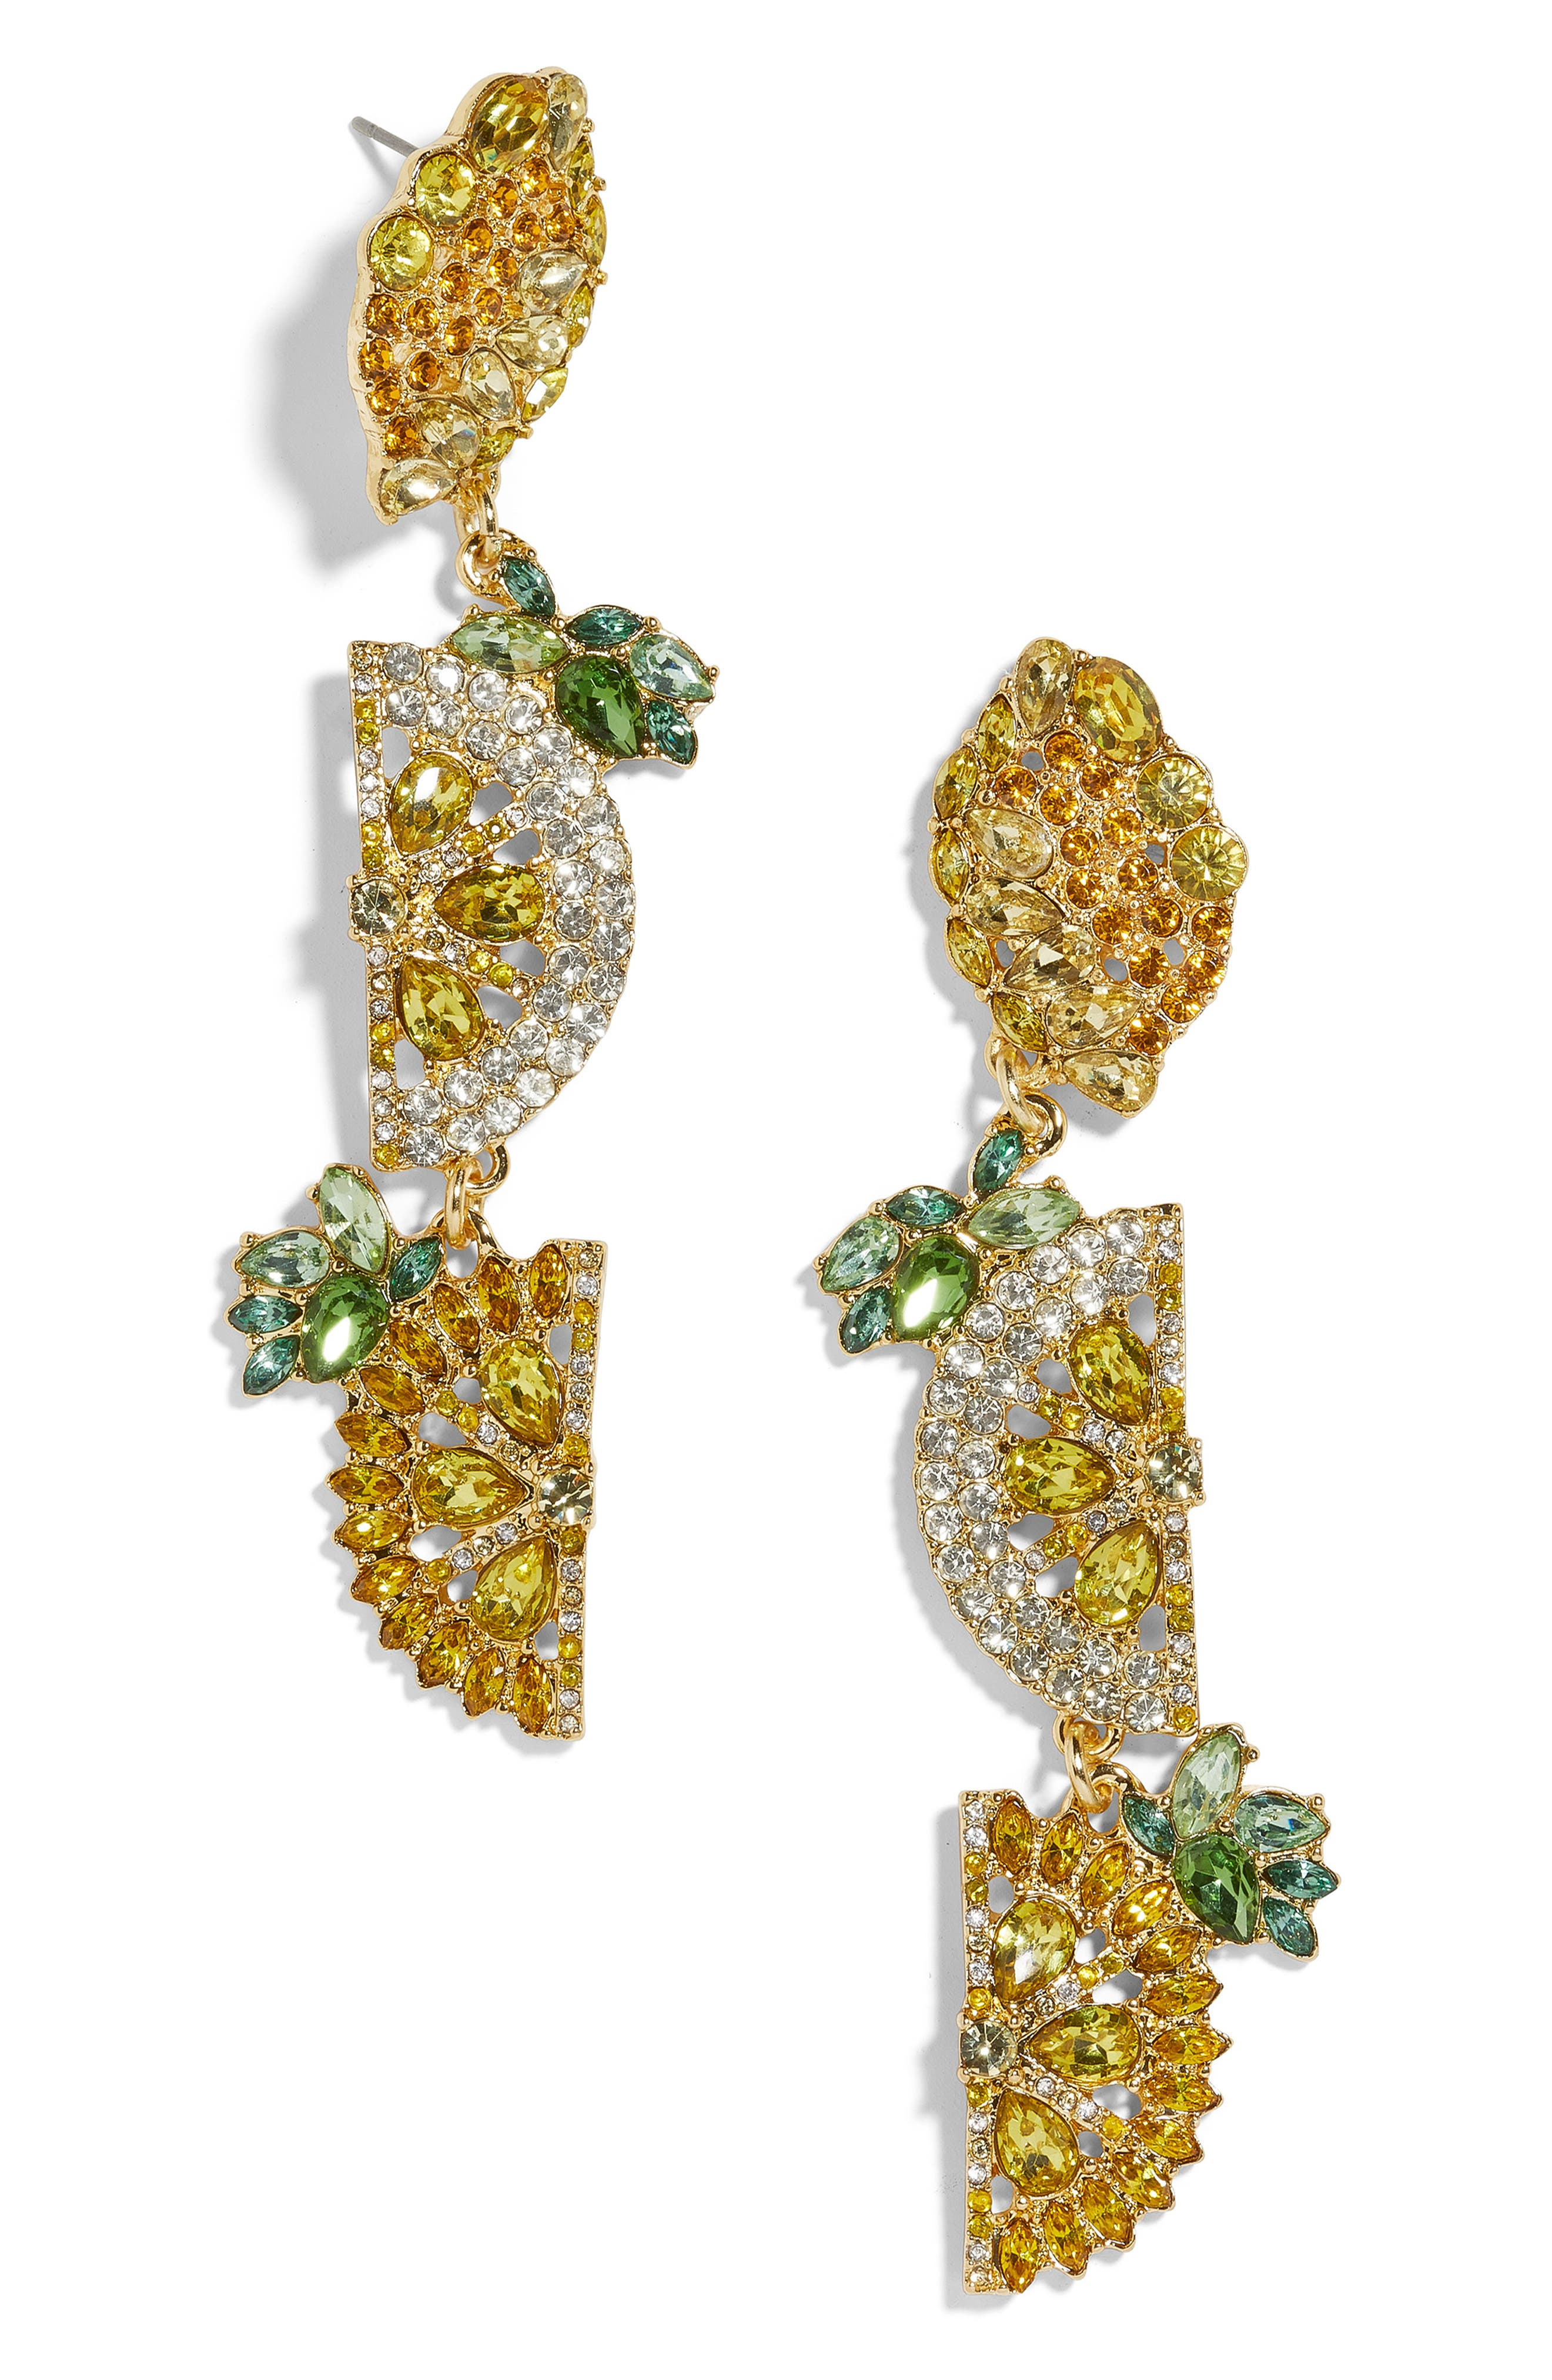 BAUBLEBAR, Lemon Drop Earrings, Main thumbnail 1, color, YELLOW